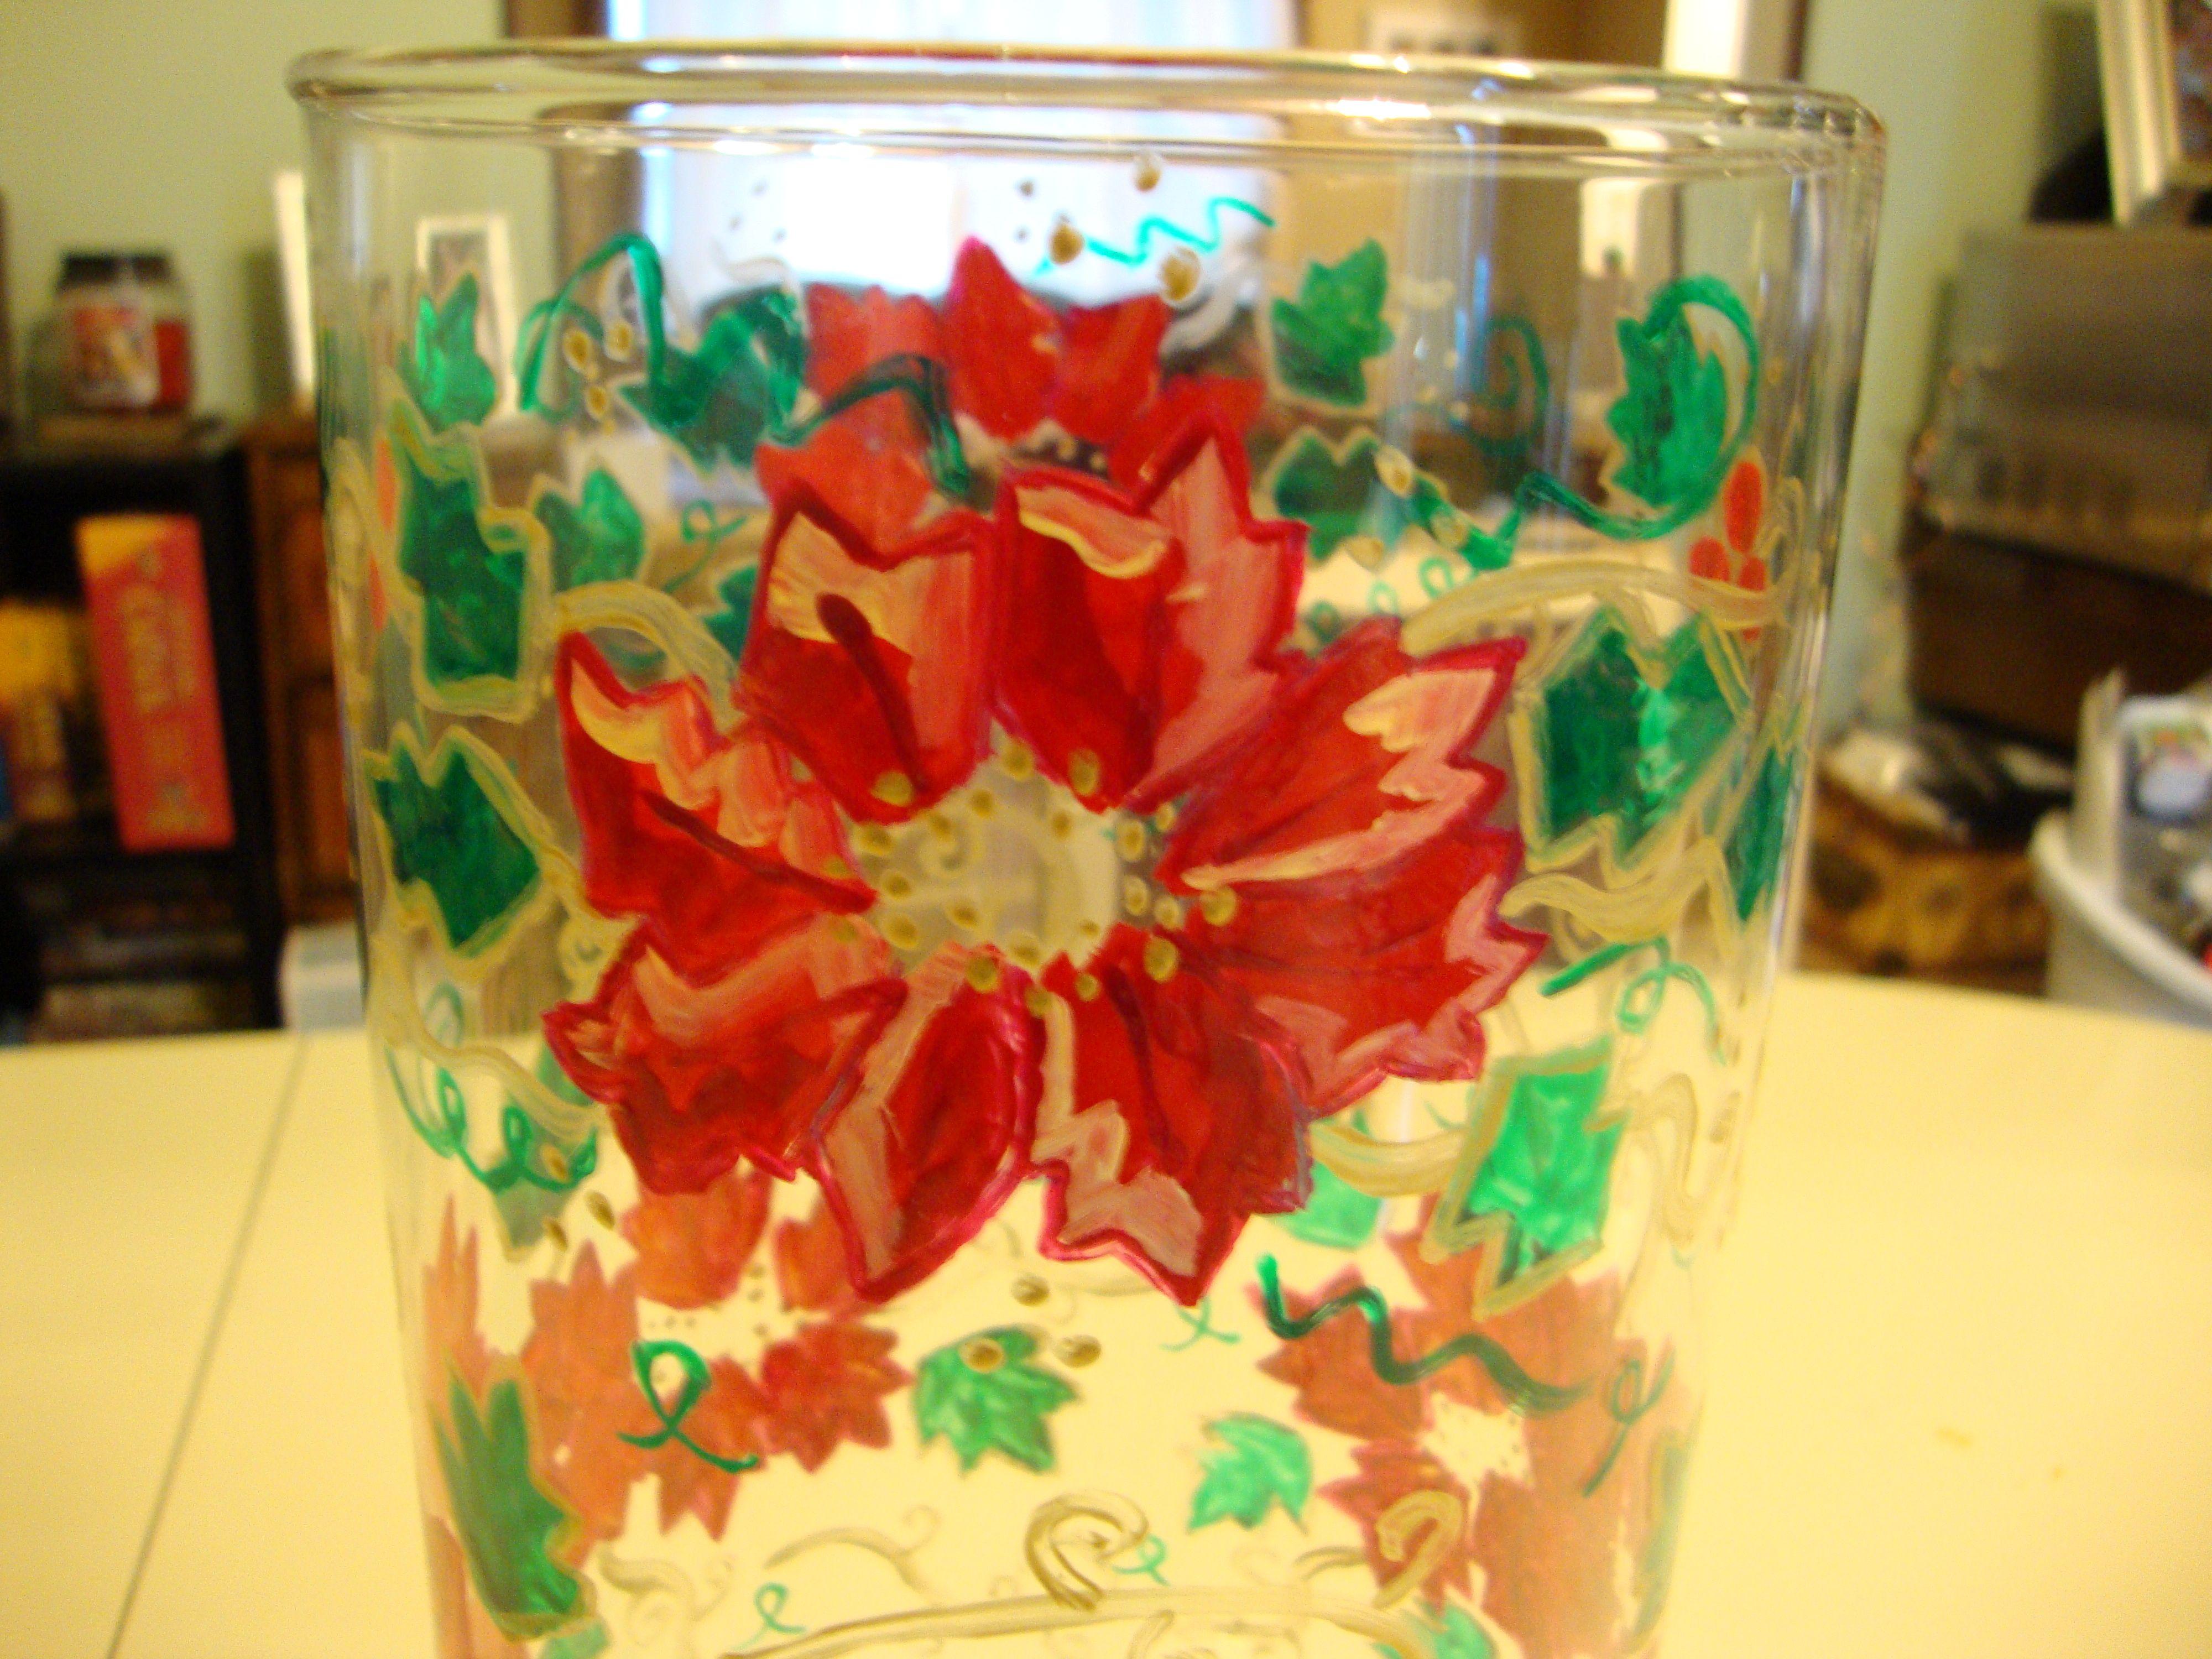 Neat homemade christmas gifts craft ideas pinterest for Neat homemade christmas gift ideas